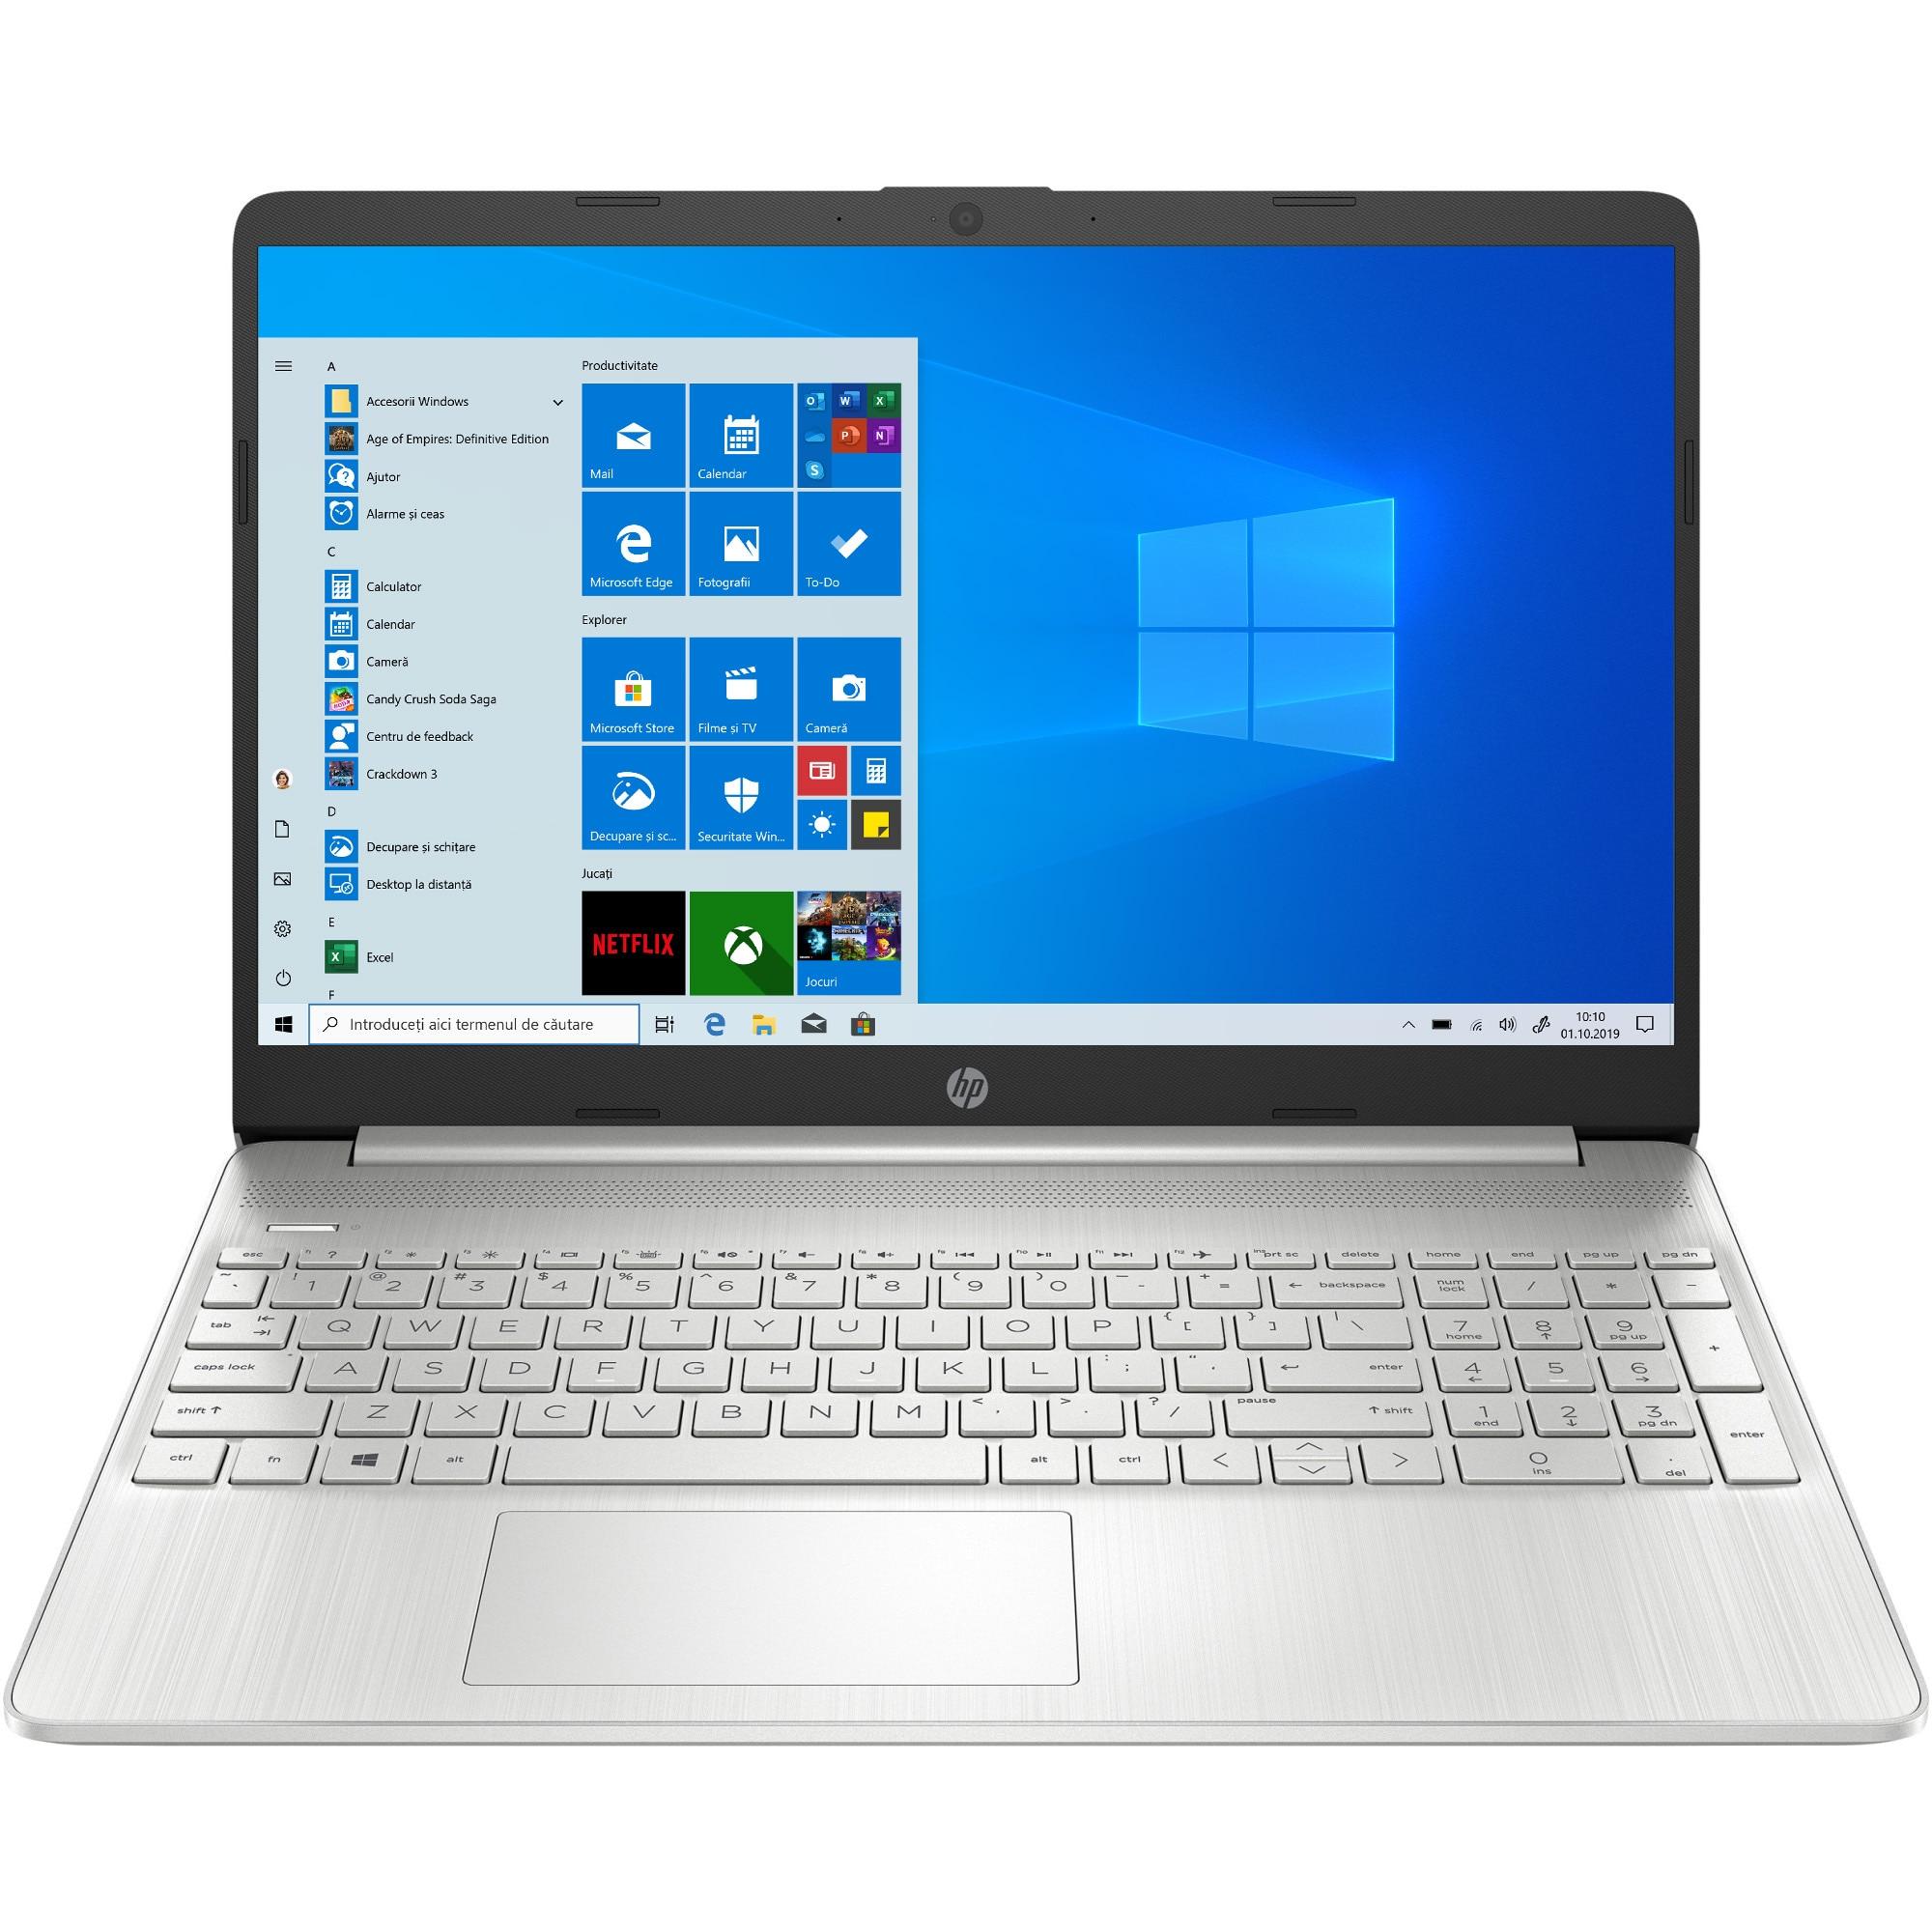 "Fotografie Laptop HP 15s-eq0777nd cu procesor AMD Ryzen™ 5 3500U pana la 3.70 GHz, 15.6"", Full HD, 16GB, 512GB SSD, AMD Radeon™ Vega 8 Graphics, Windows 10 Home, Natural silver"